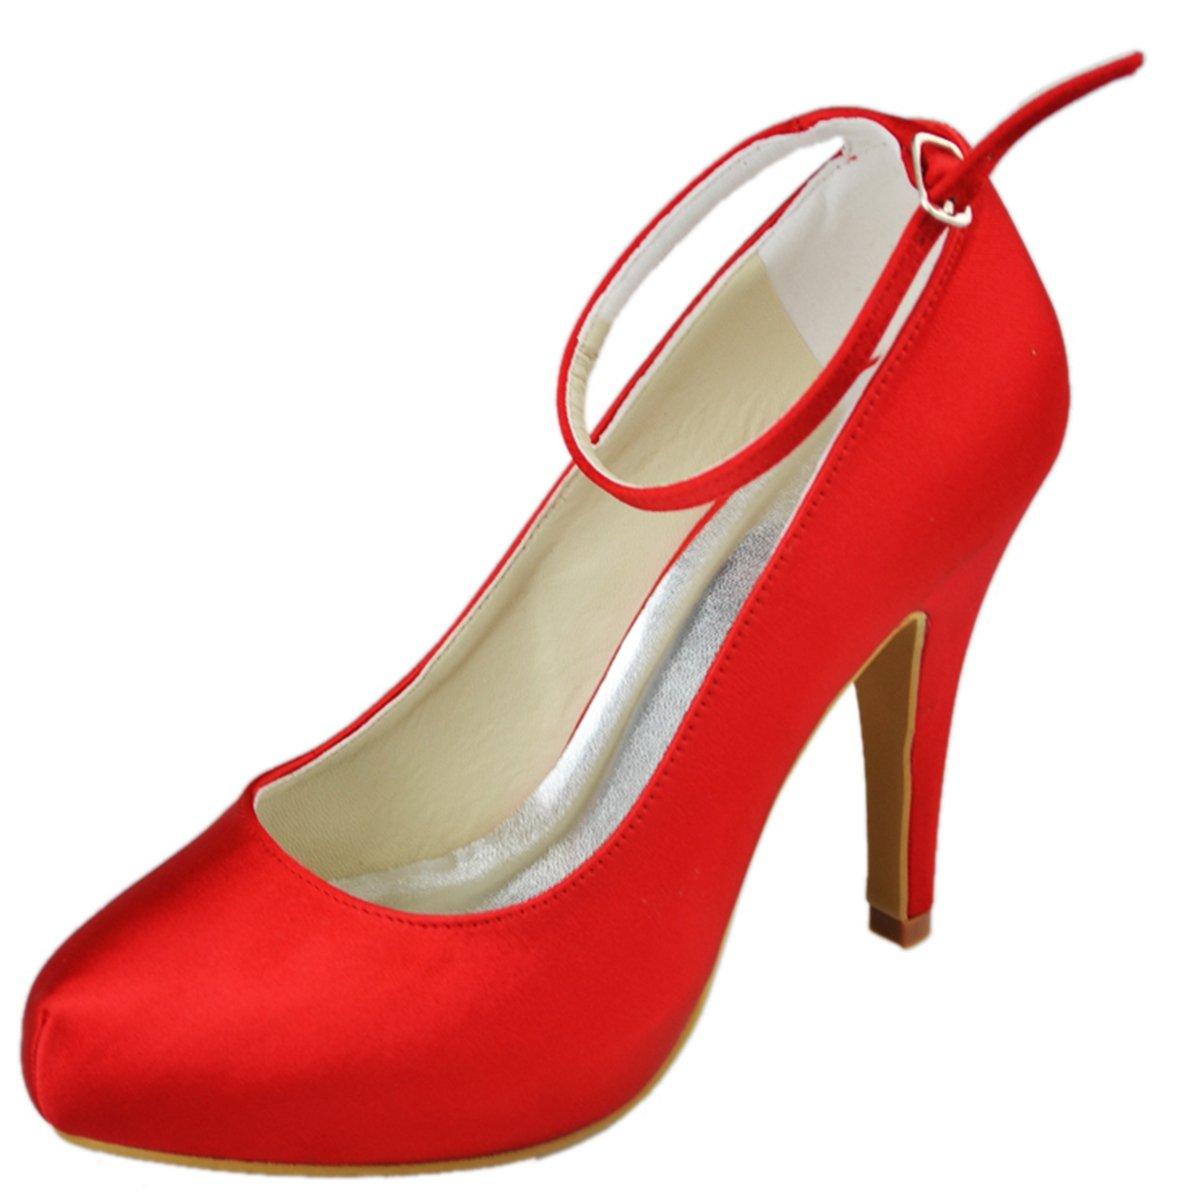 Minitoo , Bride de , rouge cheville femme 19628 Rouge - rouge ca33437 - automaticcouplings.space